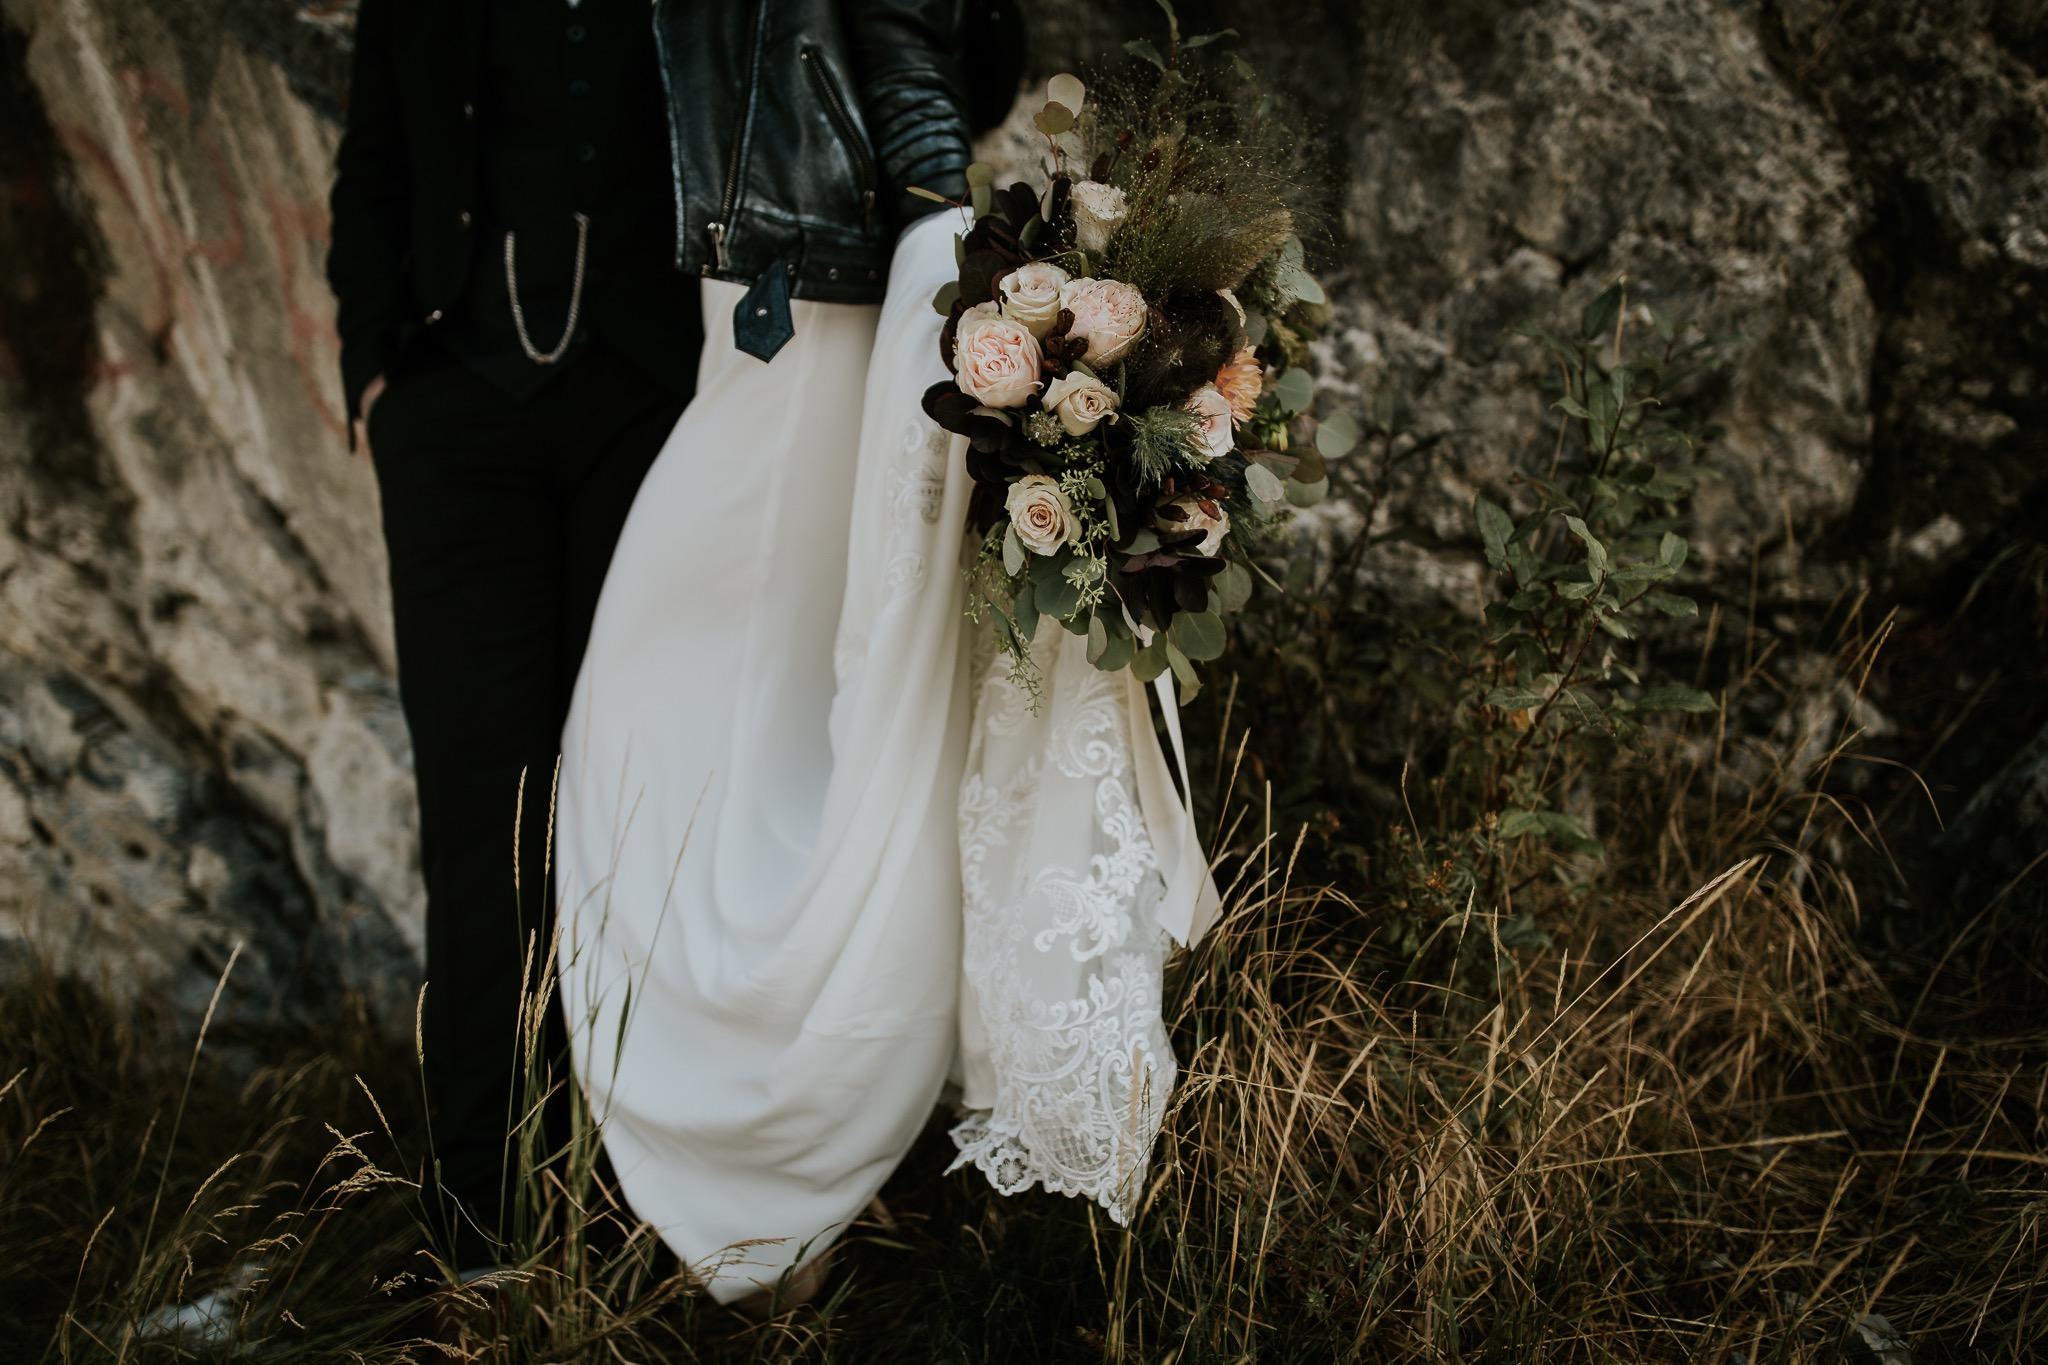 20170915-canmore-moody-wedding-photographer-creekside-creeksidestyledshoot-time&fate-5261